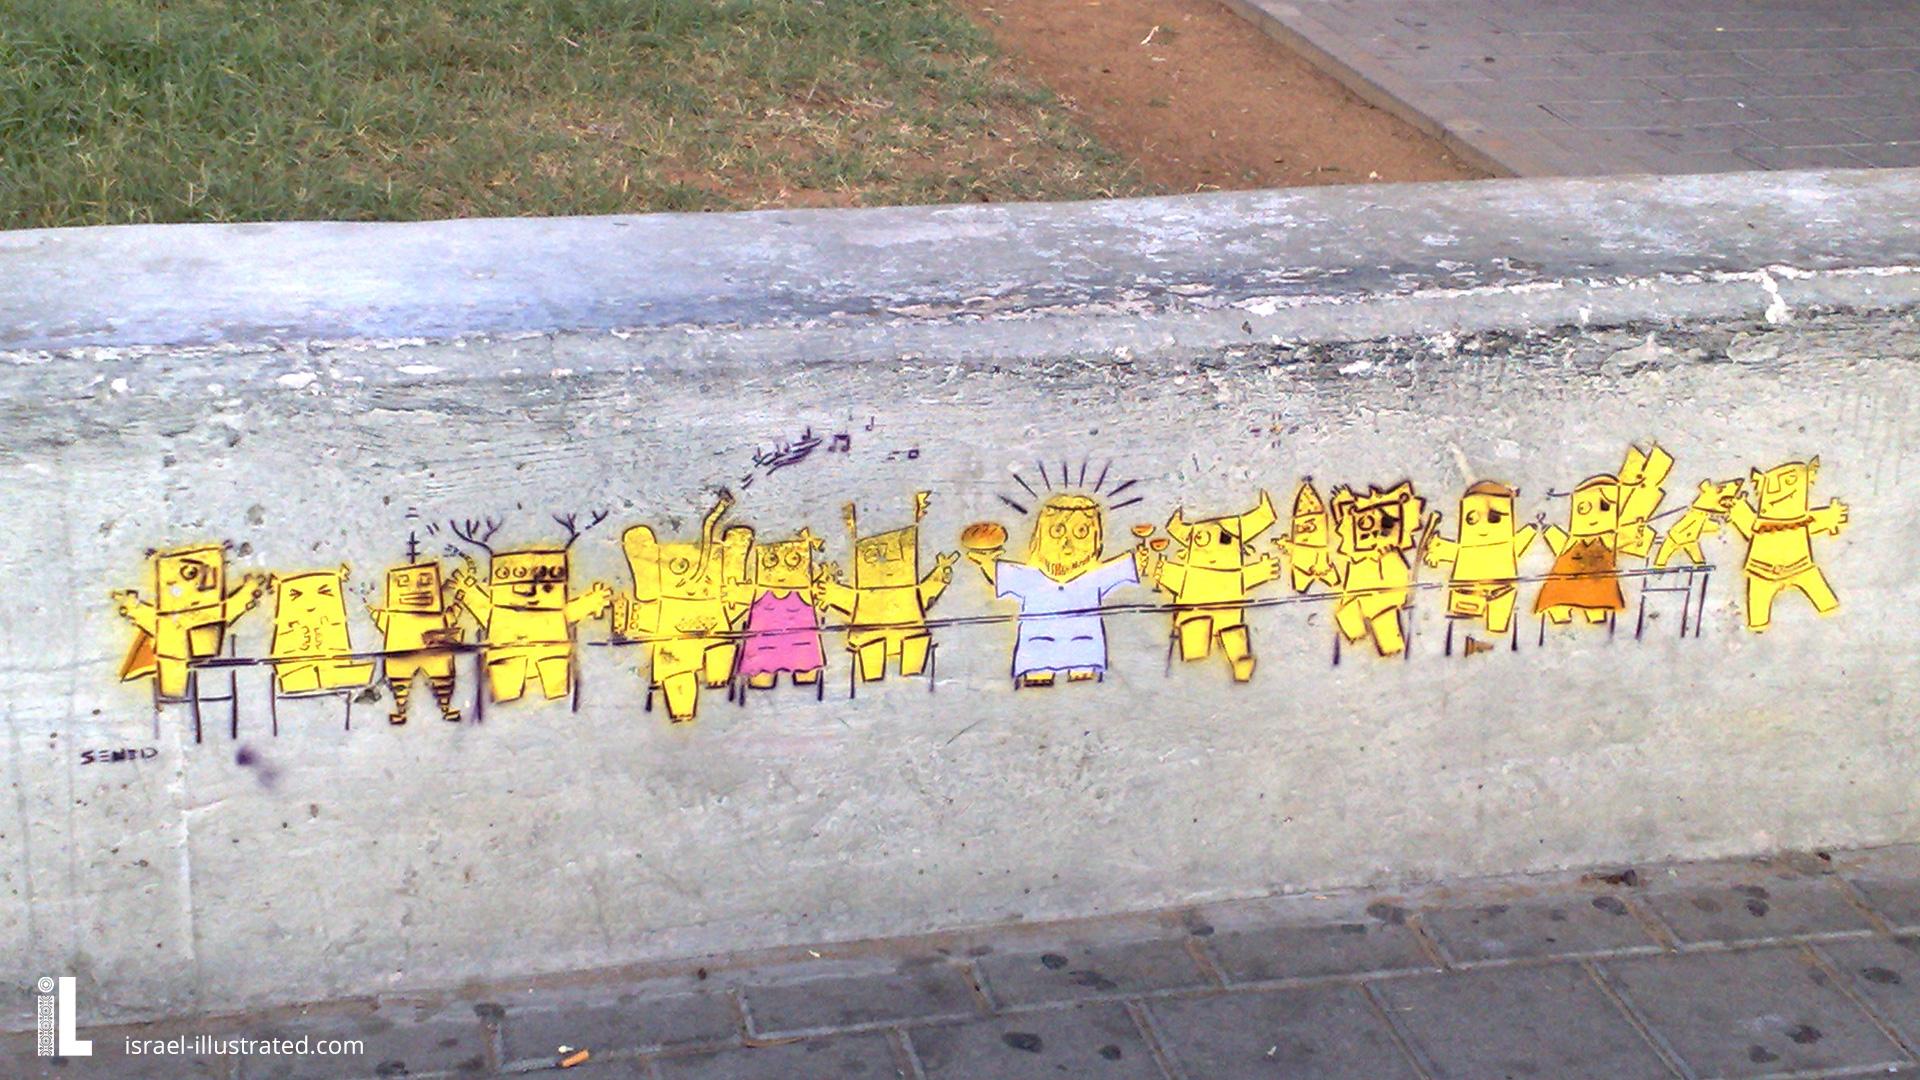 The Last Supper graffiti, Kufsonim by Sened